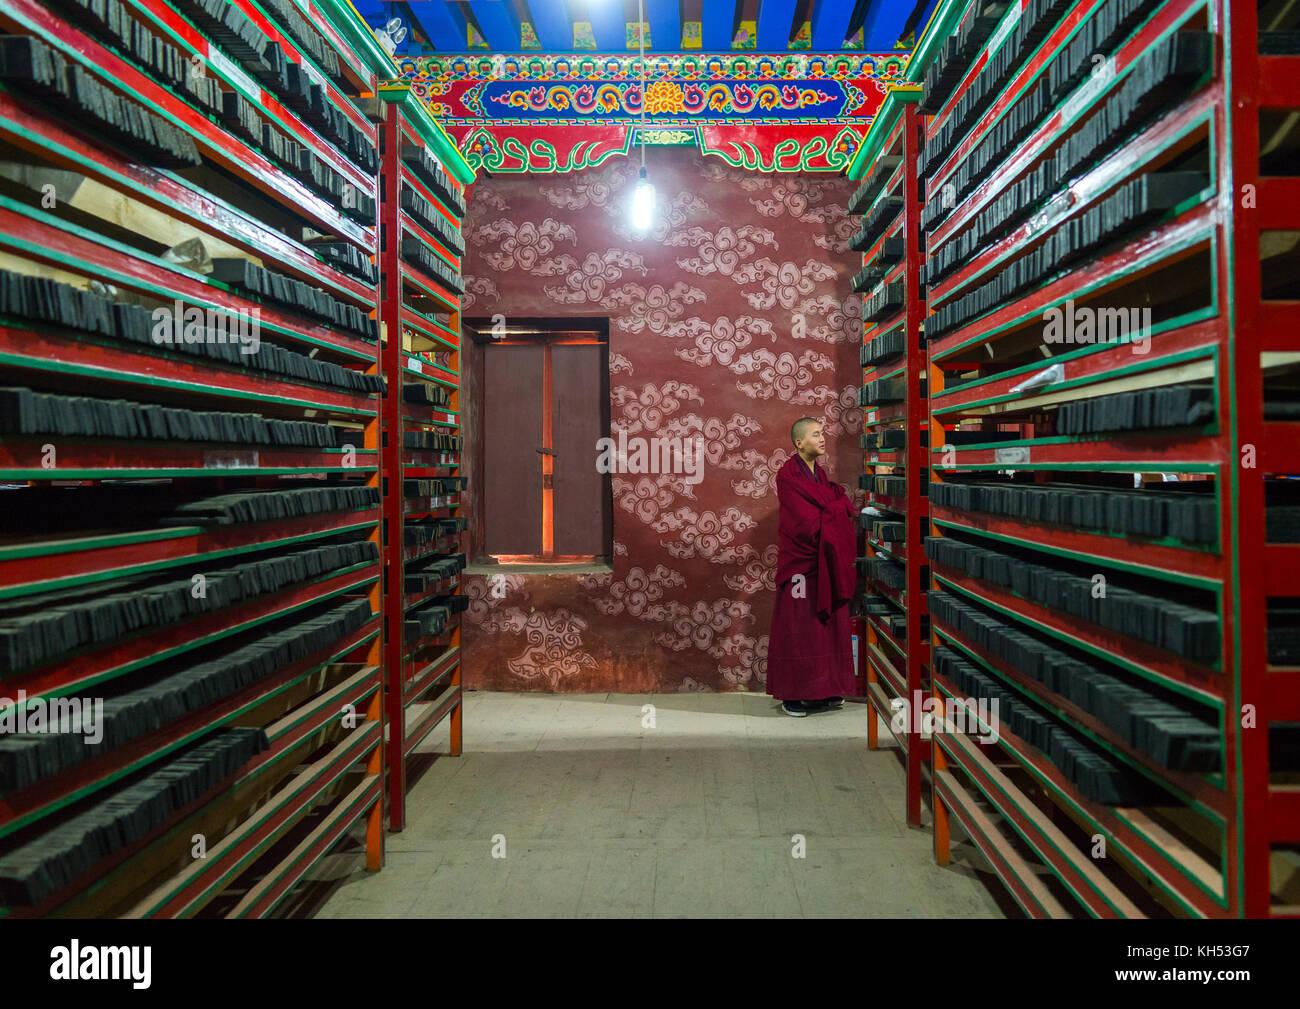 Tibetische Schrift aus Holzblöcken in Barkhang Bibliothek gedruckt, Provinz Gansu, Labrang, China Stockbild